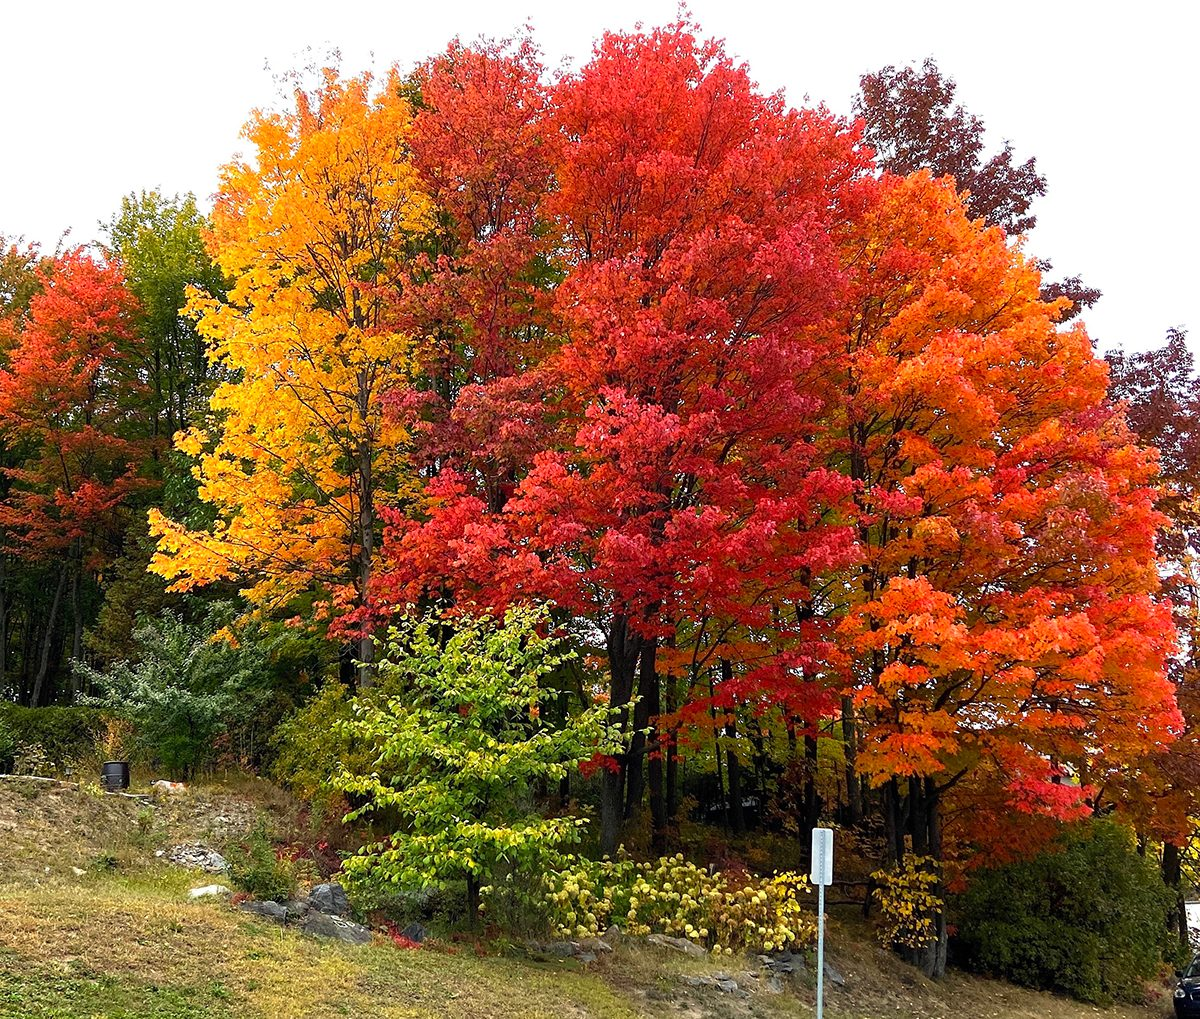 My Happy Place - Bright Fall Foliage